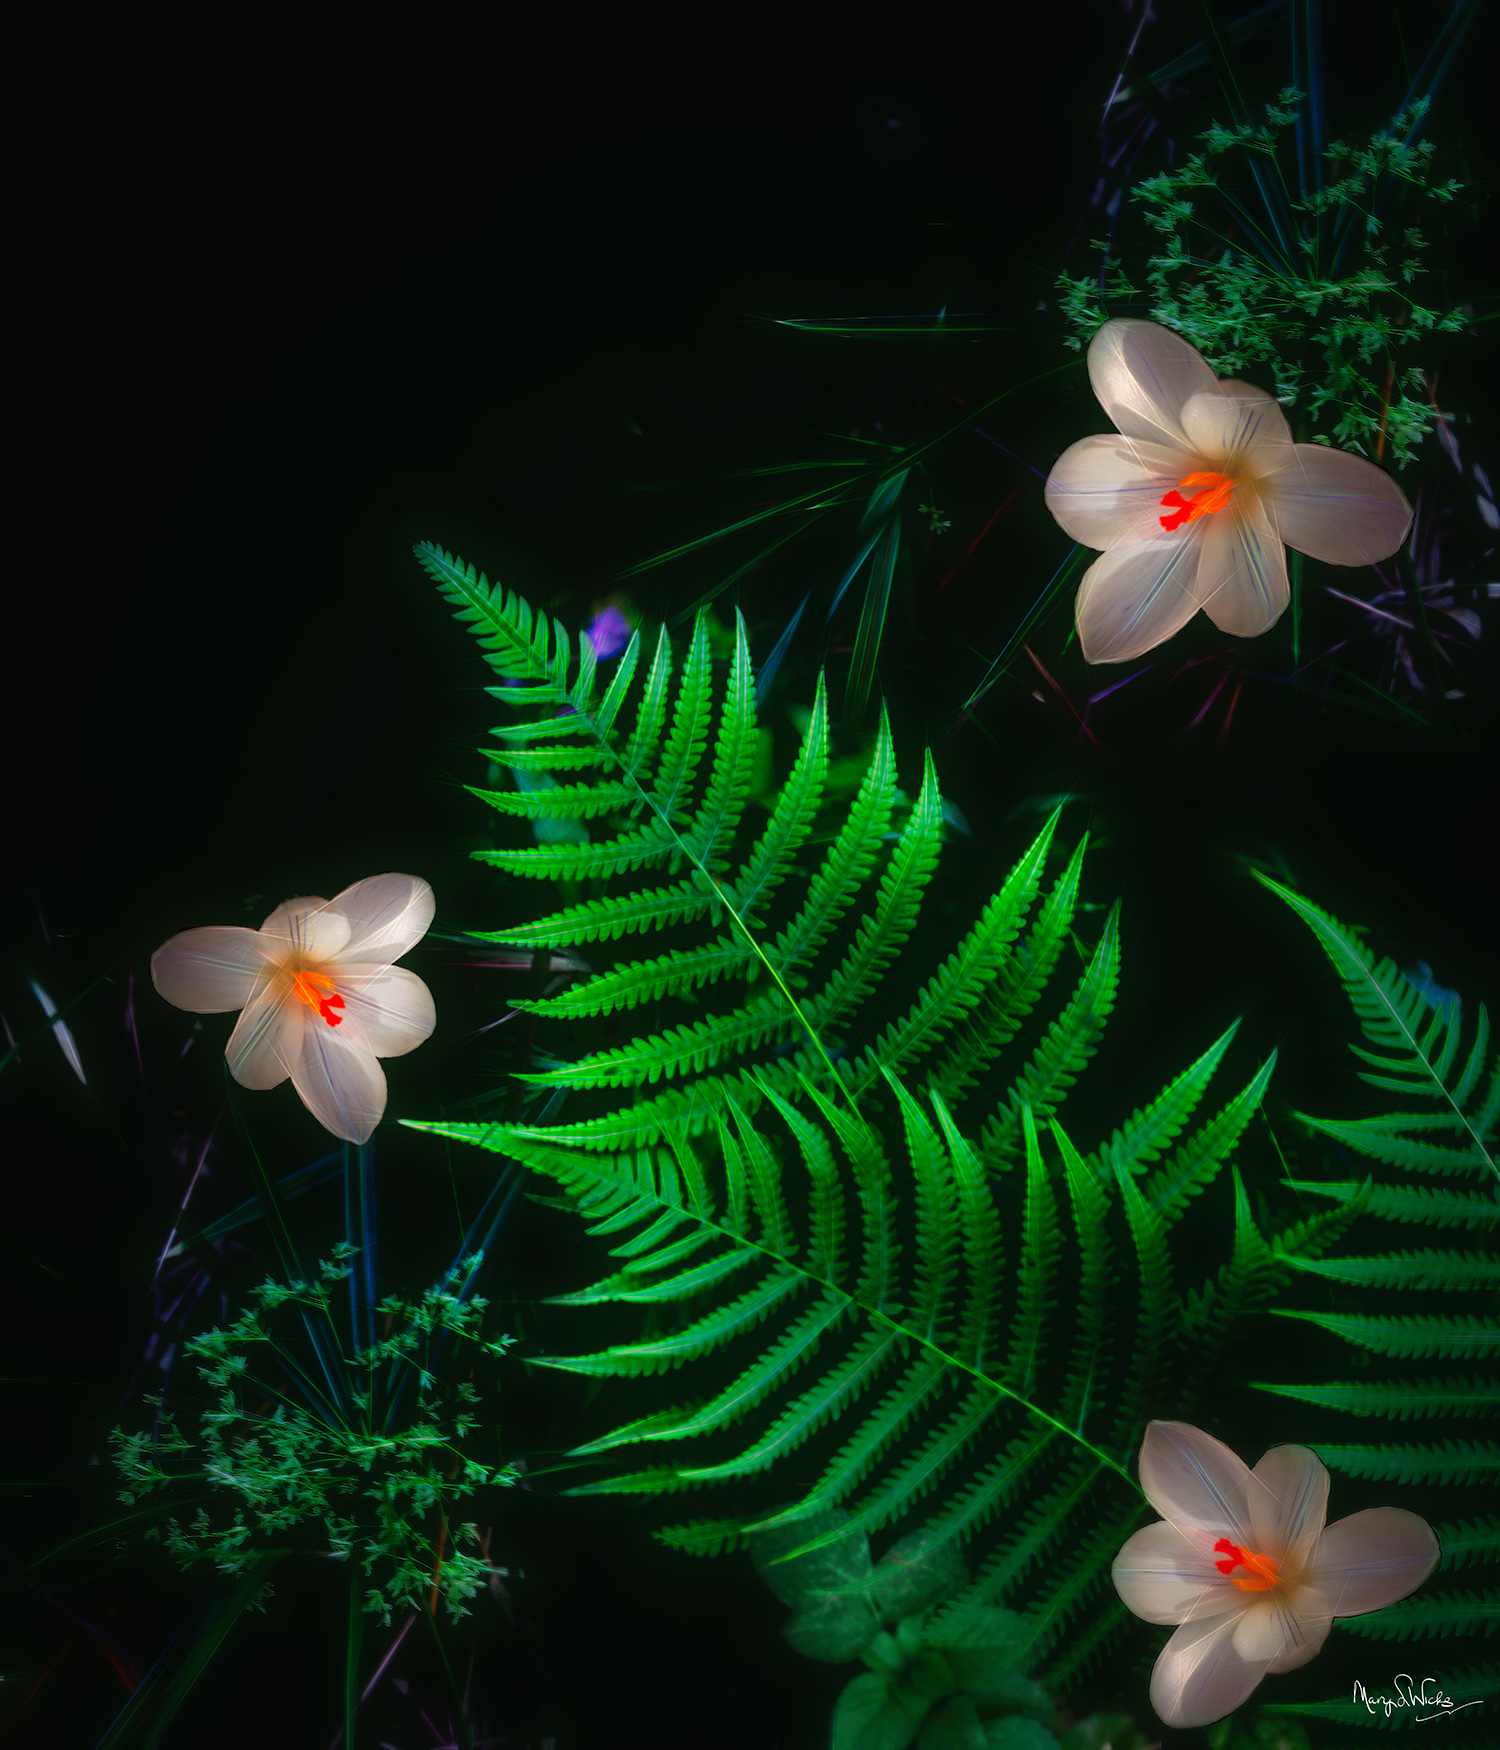 Ferns and Crocus